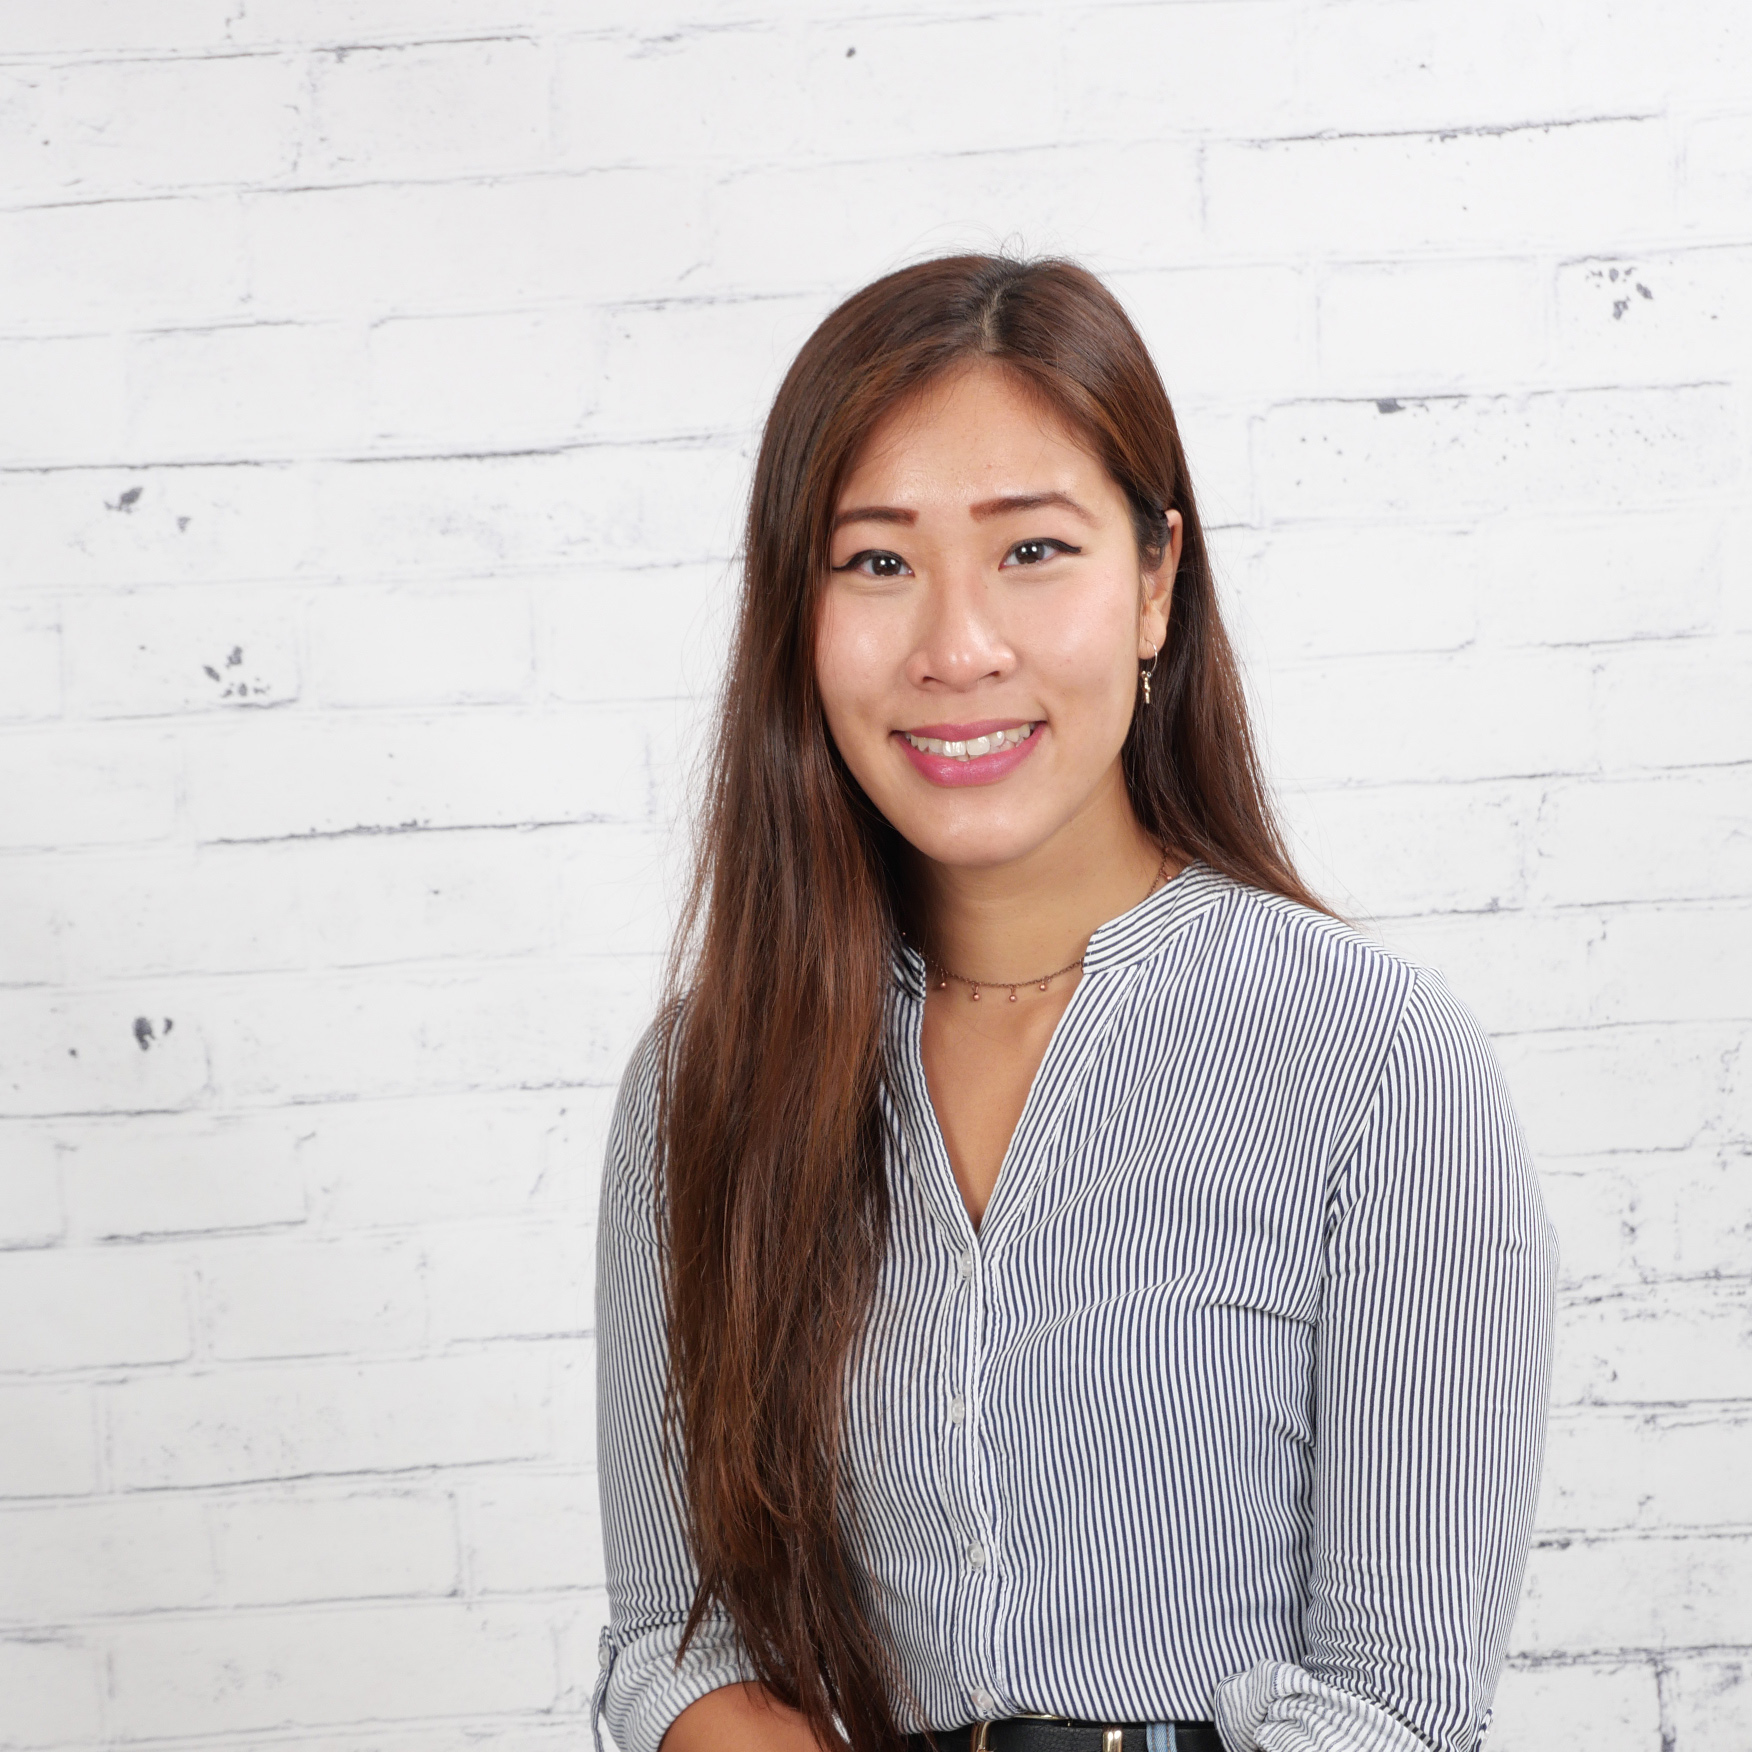 Profilbild von Mai Nguyen